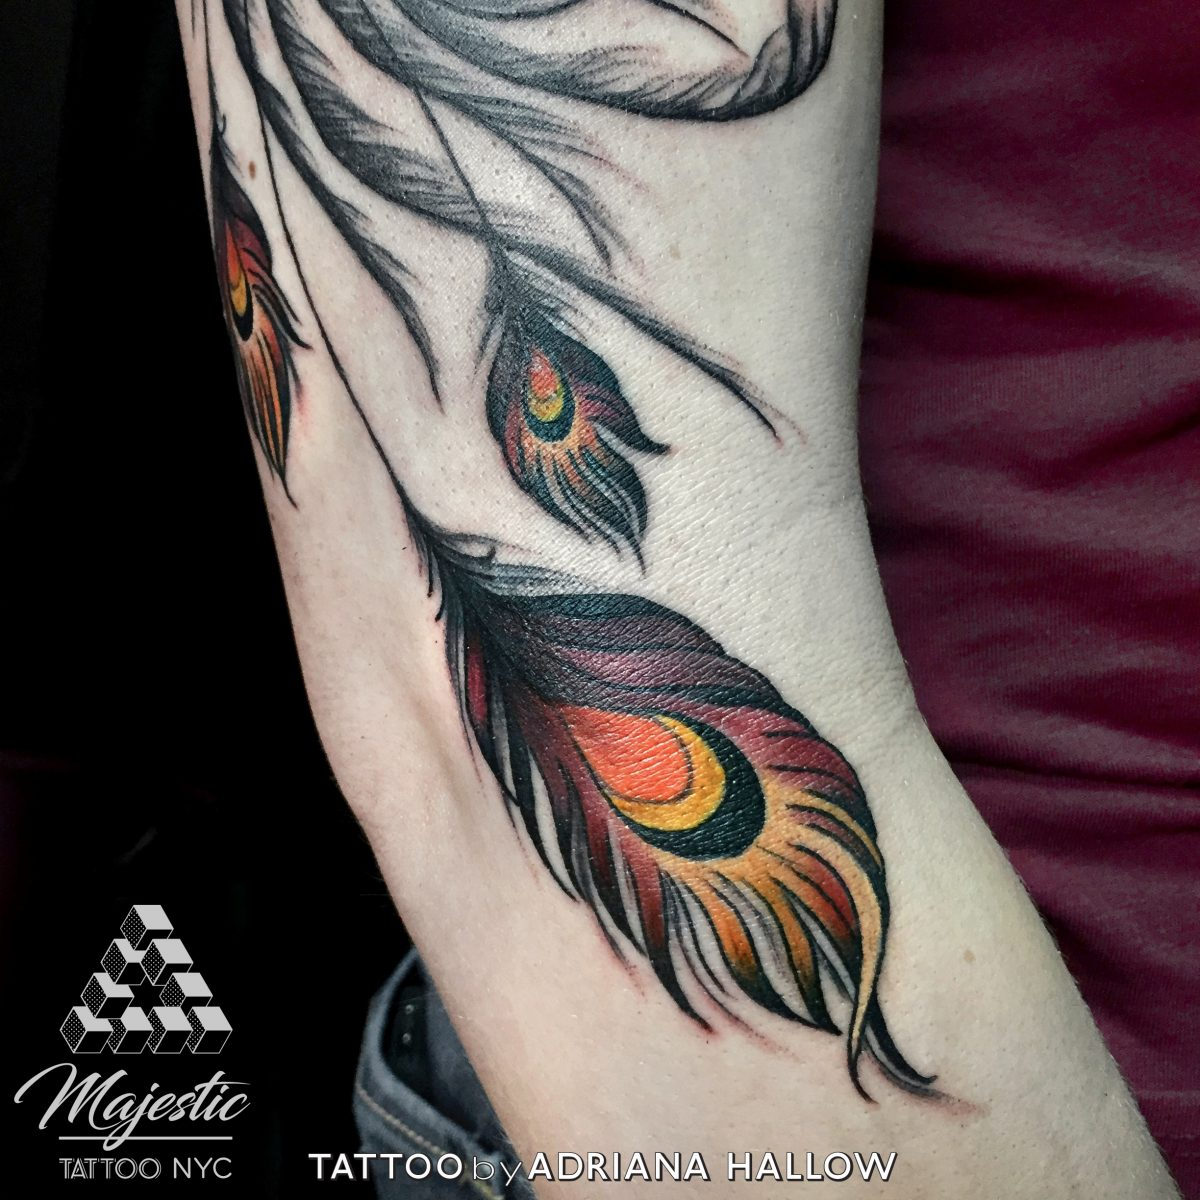 100 cheap tattoos nyc smoking tattoos nyc smoking for Cheap tattoos nyc